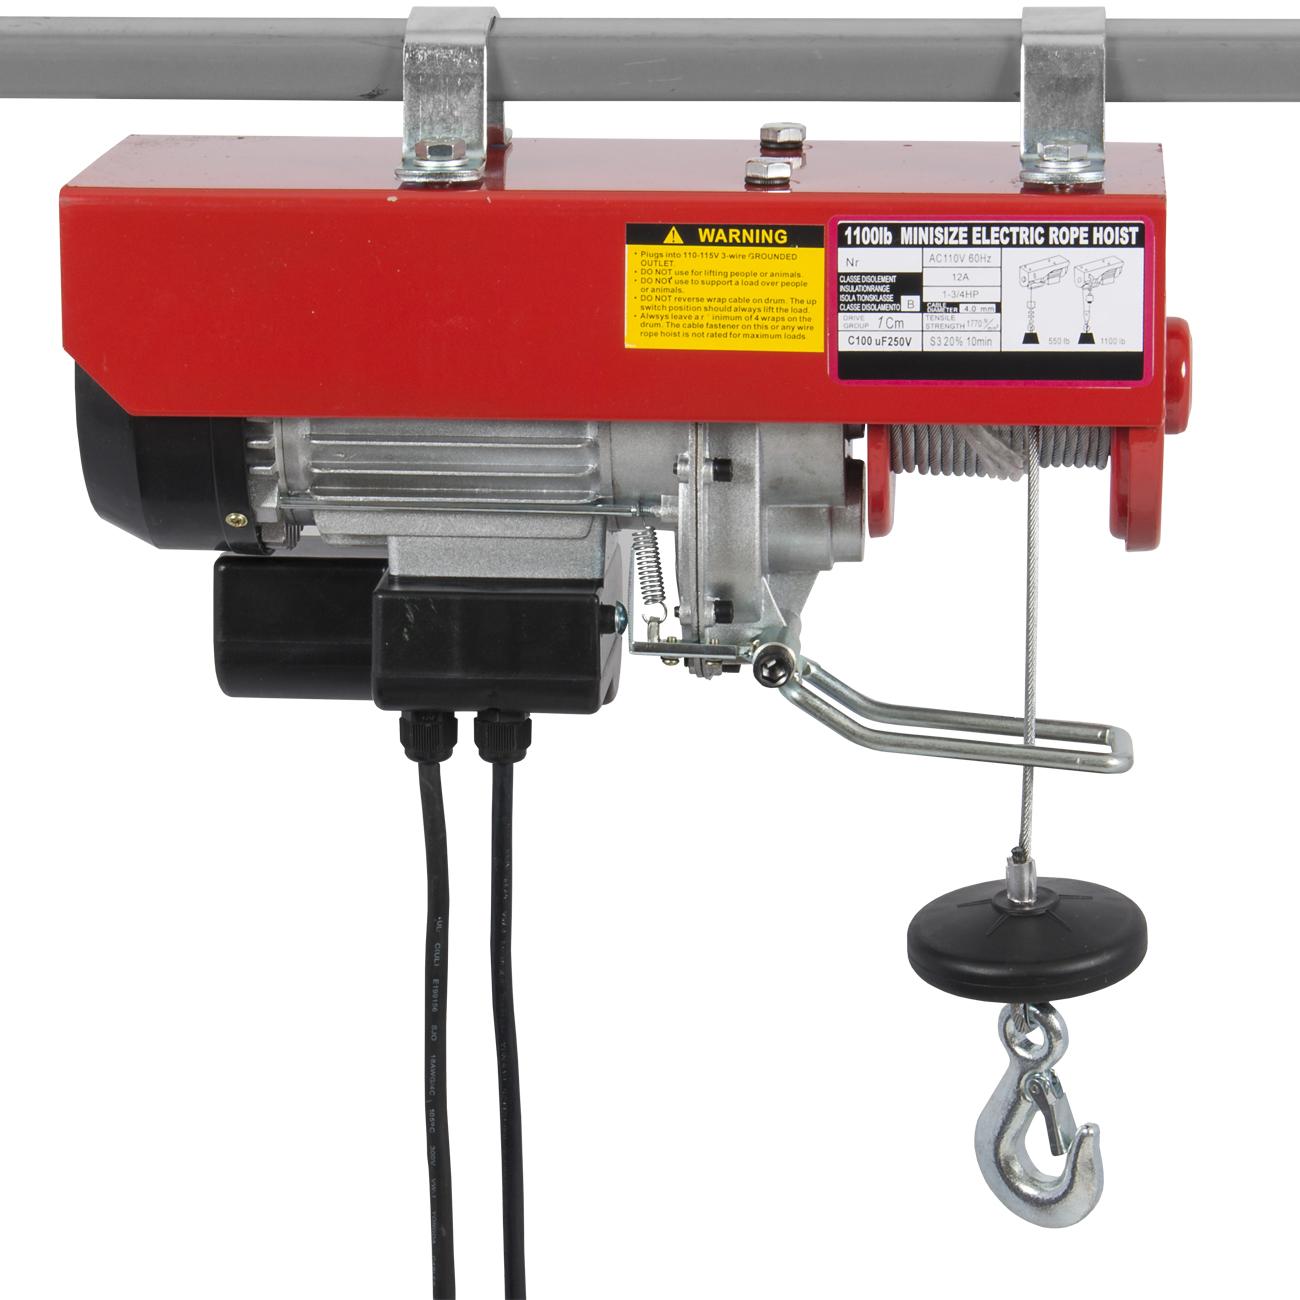 Electric Cable Hoist : Industrail electric wire hoist remote control garage shop